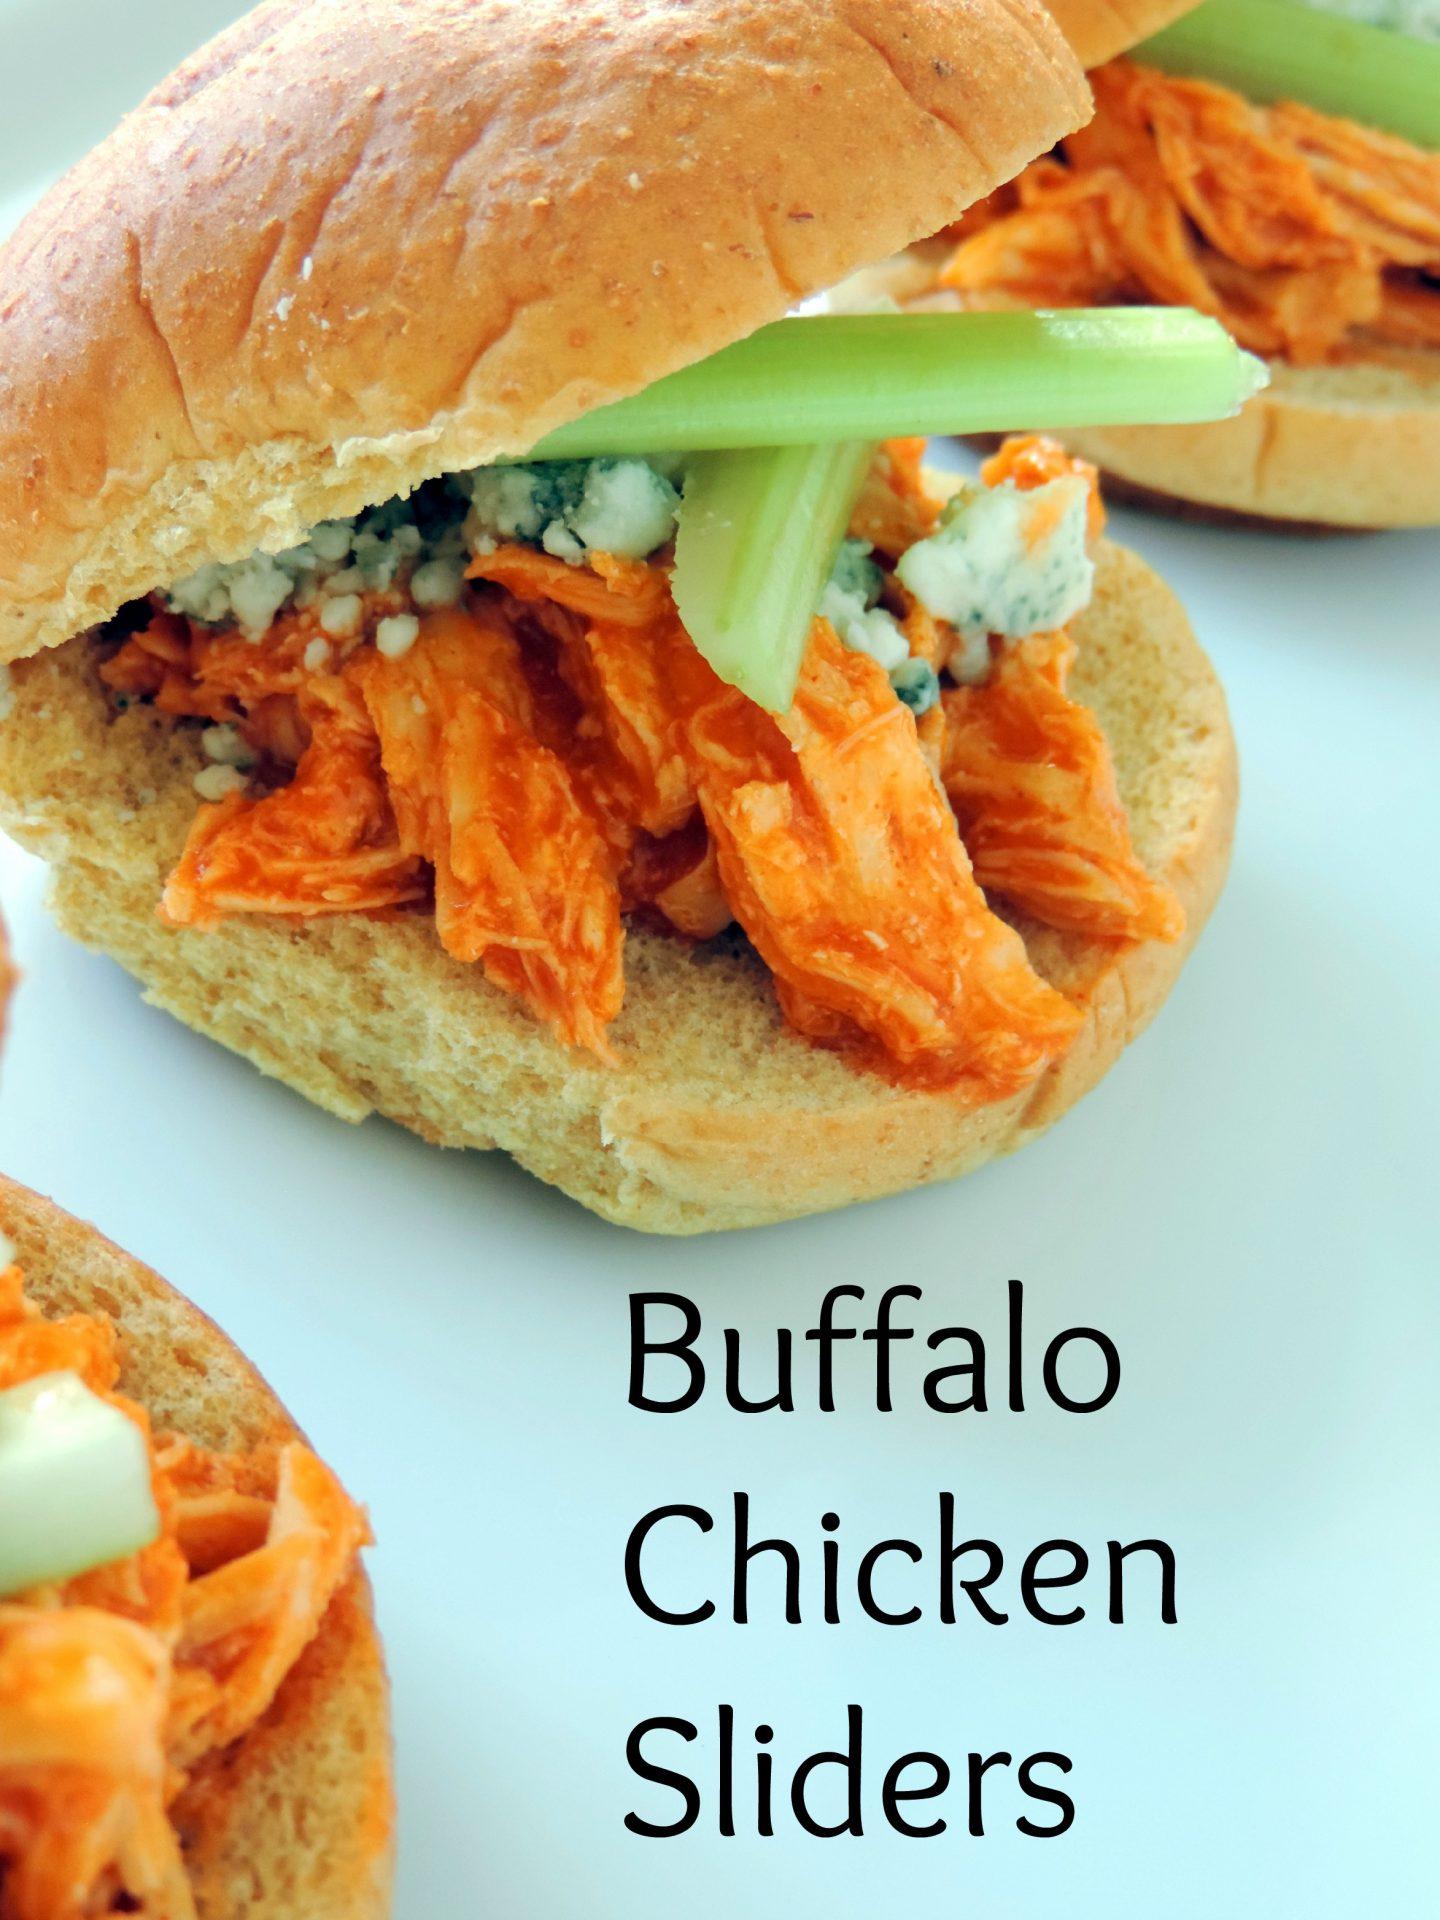 Buffalo Chicken Sliders